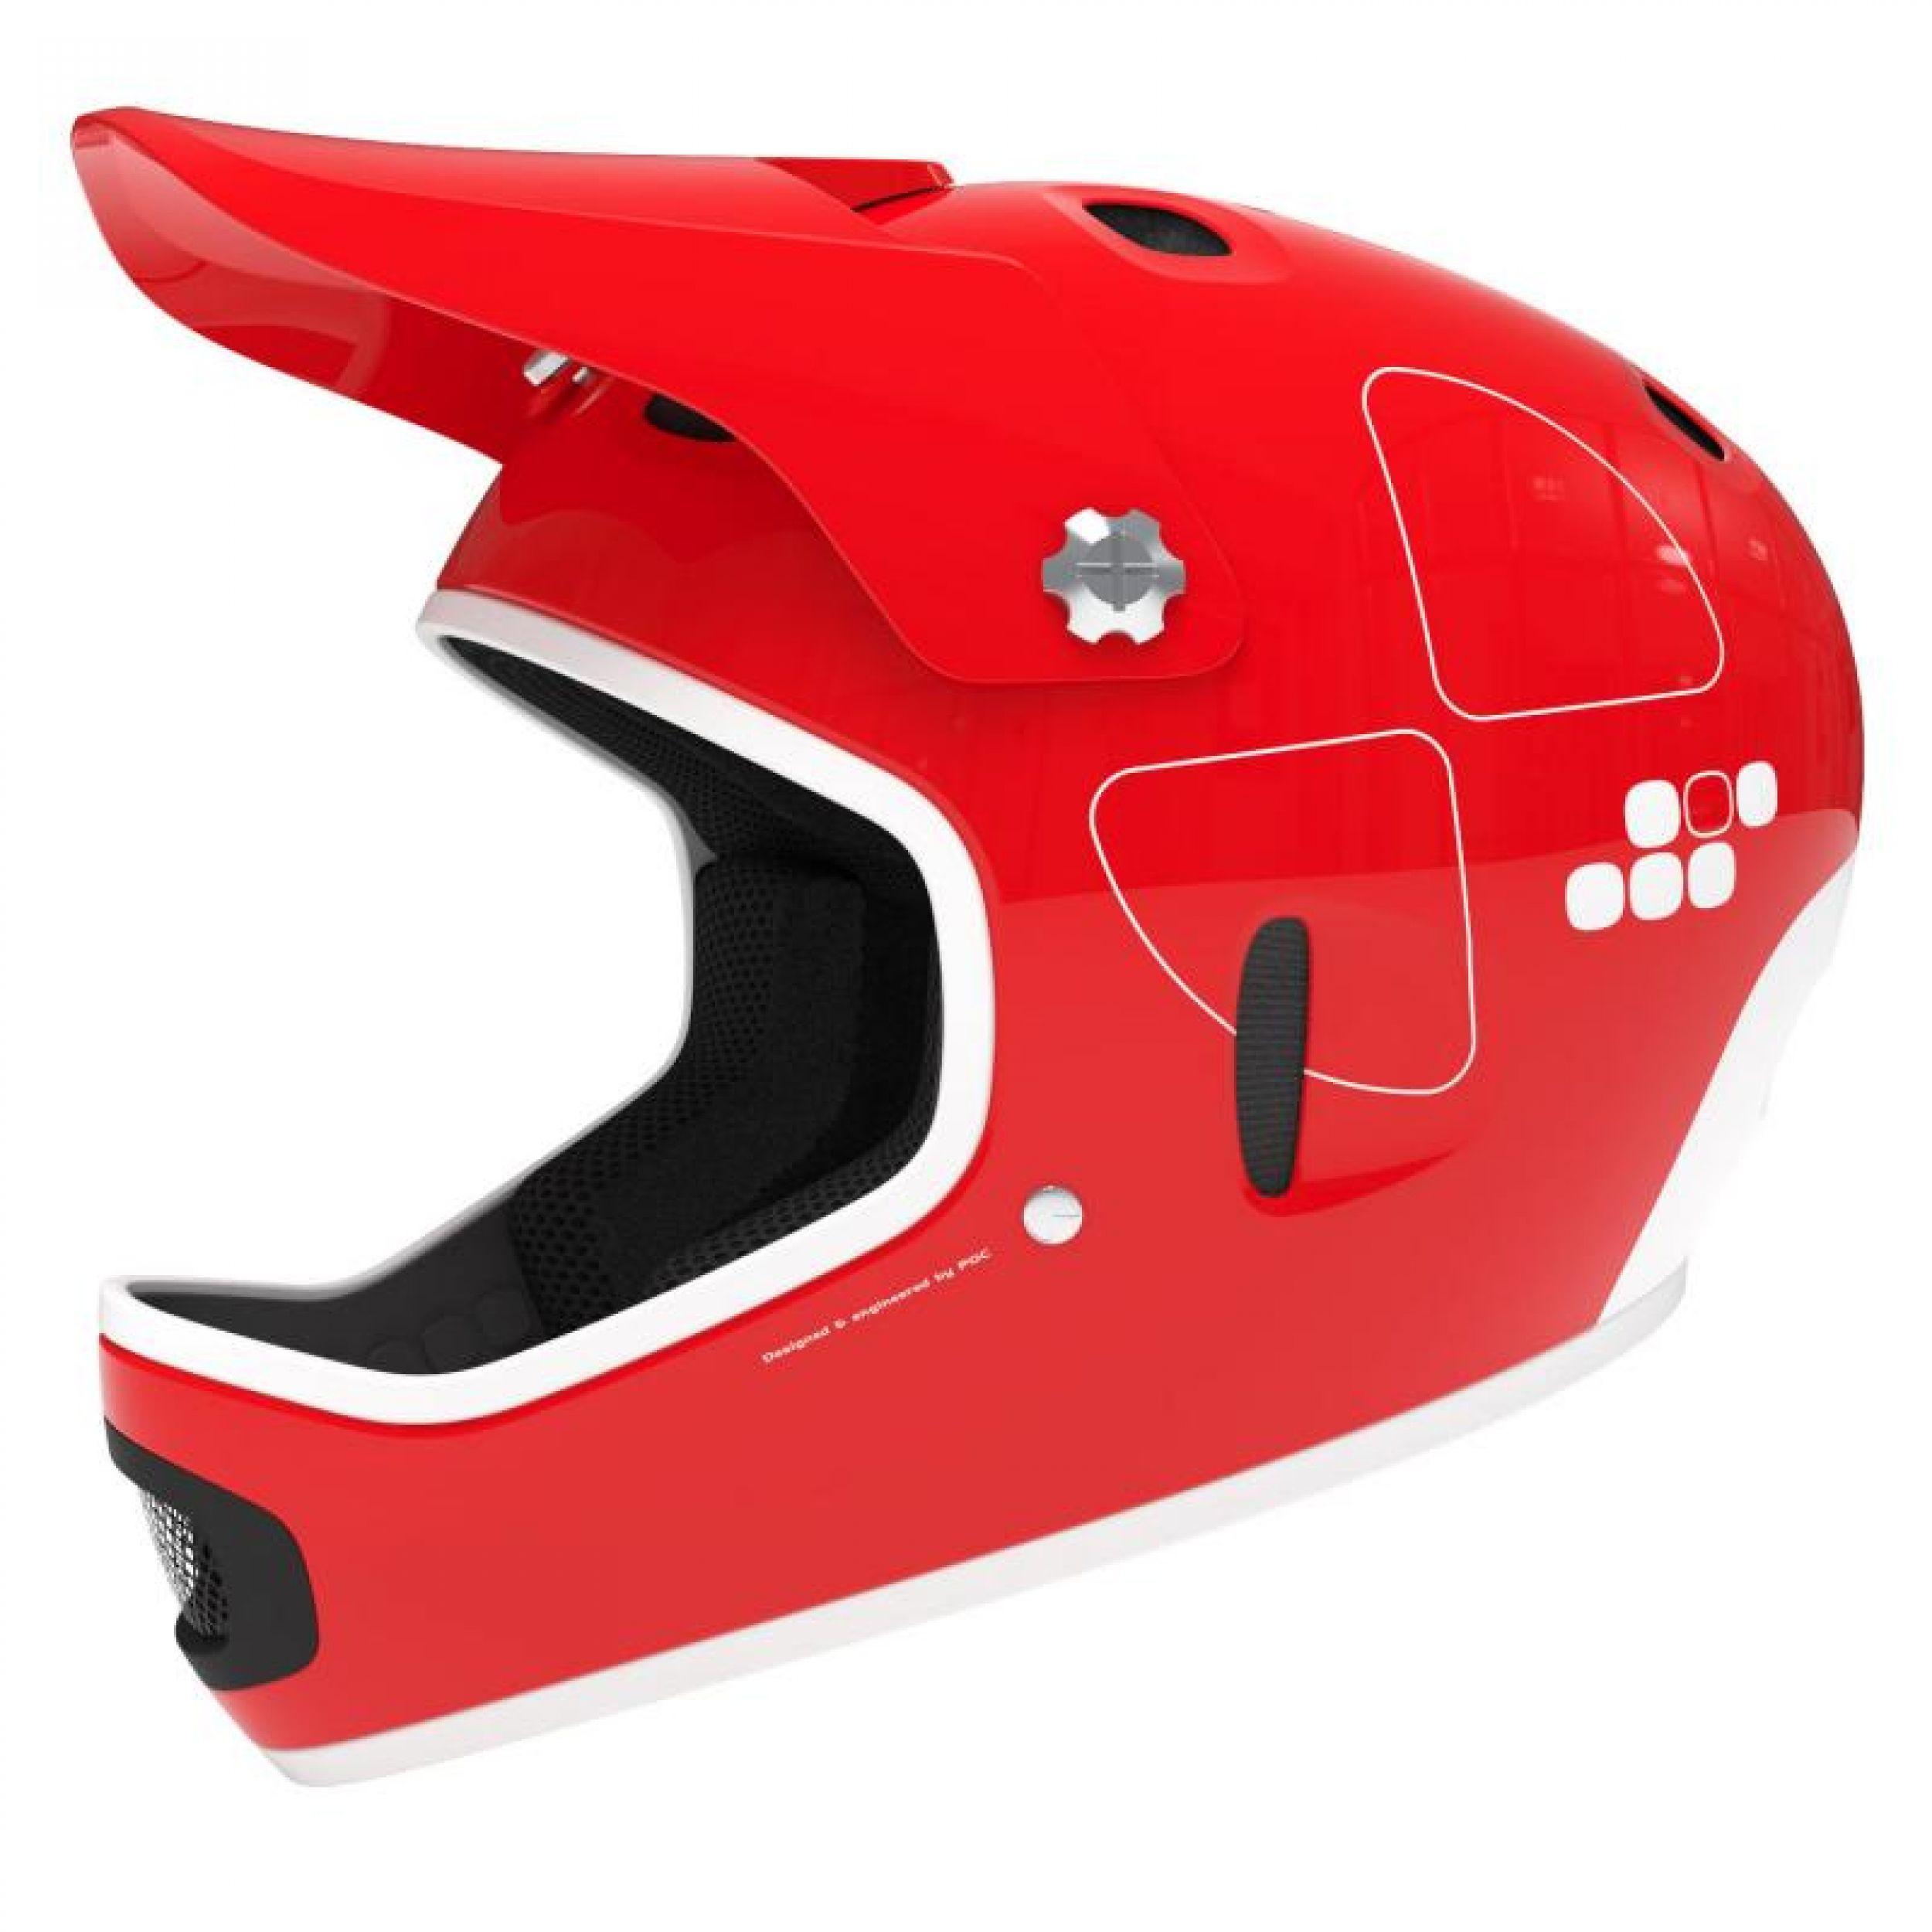 POC-Cortex-Flow-Helmet-Full-Face-Helmets-Bohrium-Red-2015-PO-51831.jpg